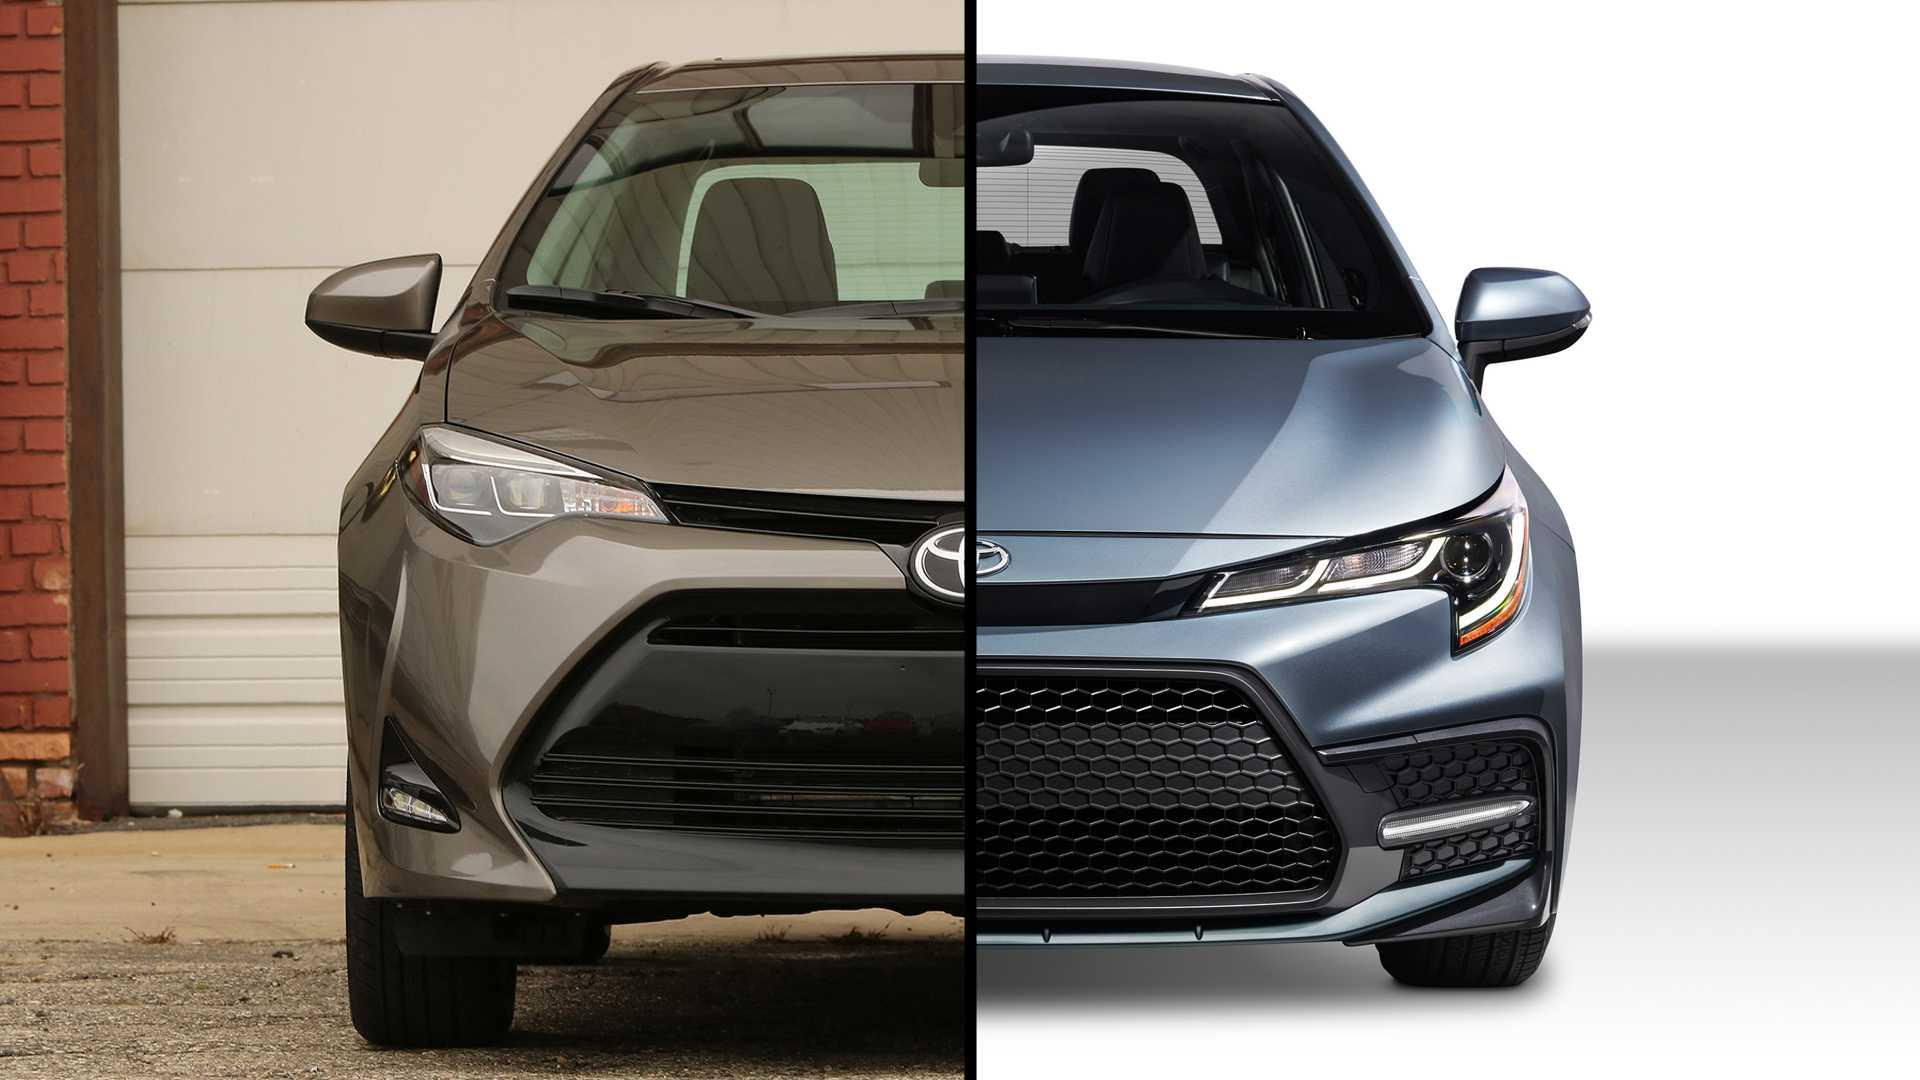 48 Great Toyota Altis 2020 Thailand Pictures for Toyota Altis 2020 Thailand